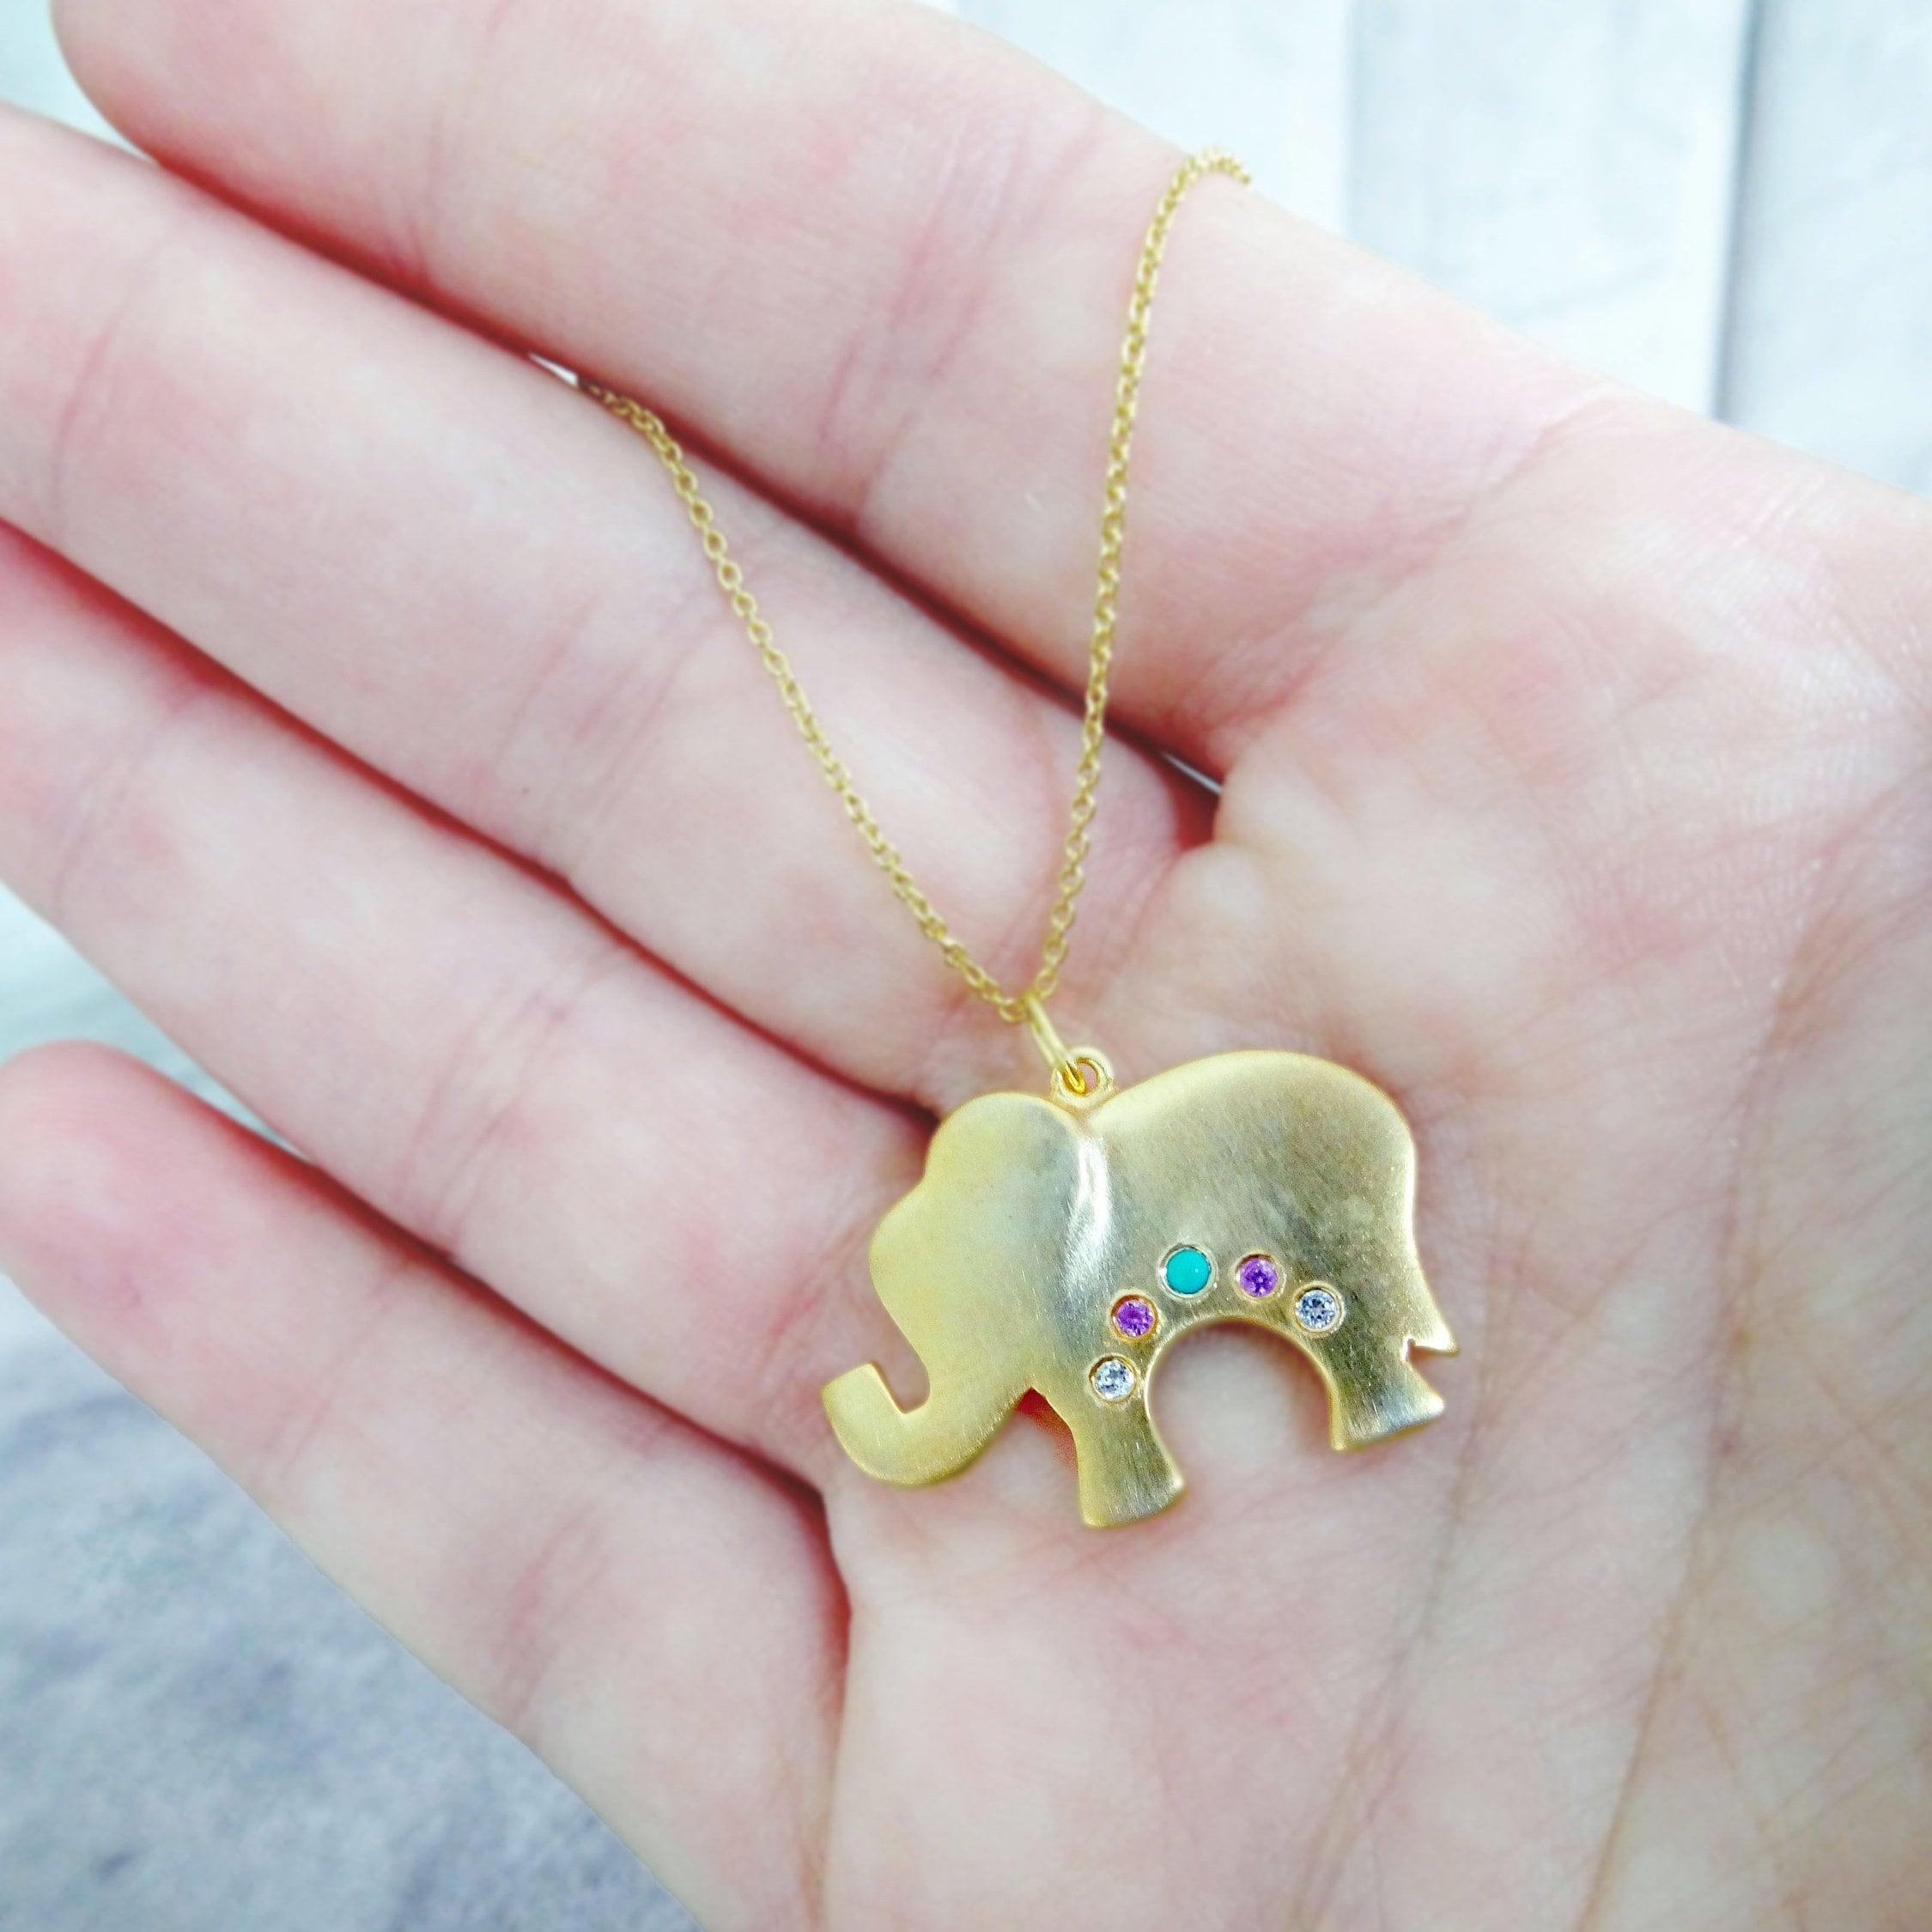 Lucky Elephant Christmas Gift Birthstone Necklace Gift for Her Elephant Charm Necklace Elephant Jewelry